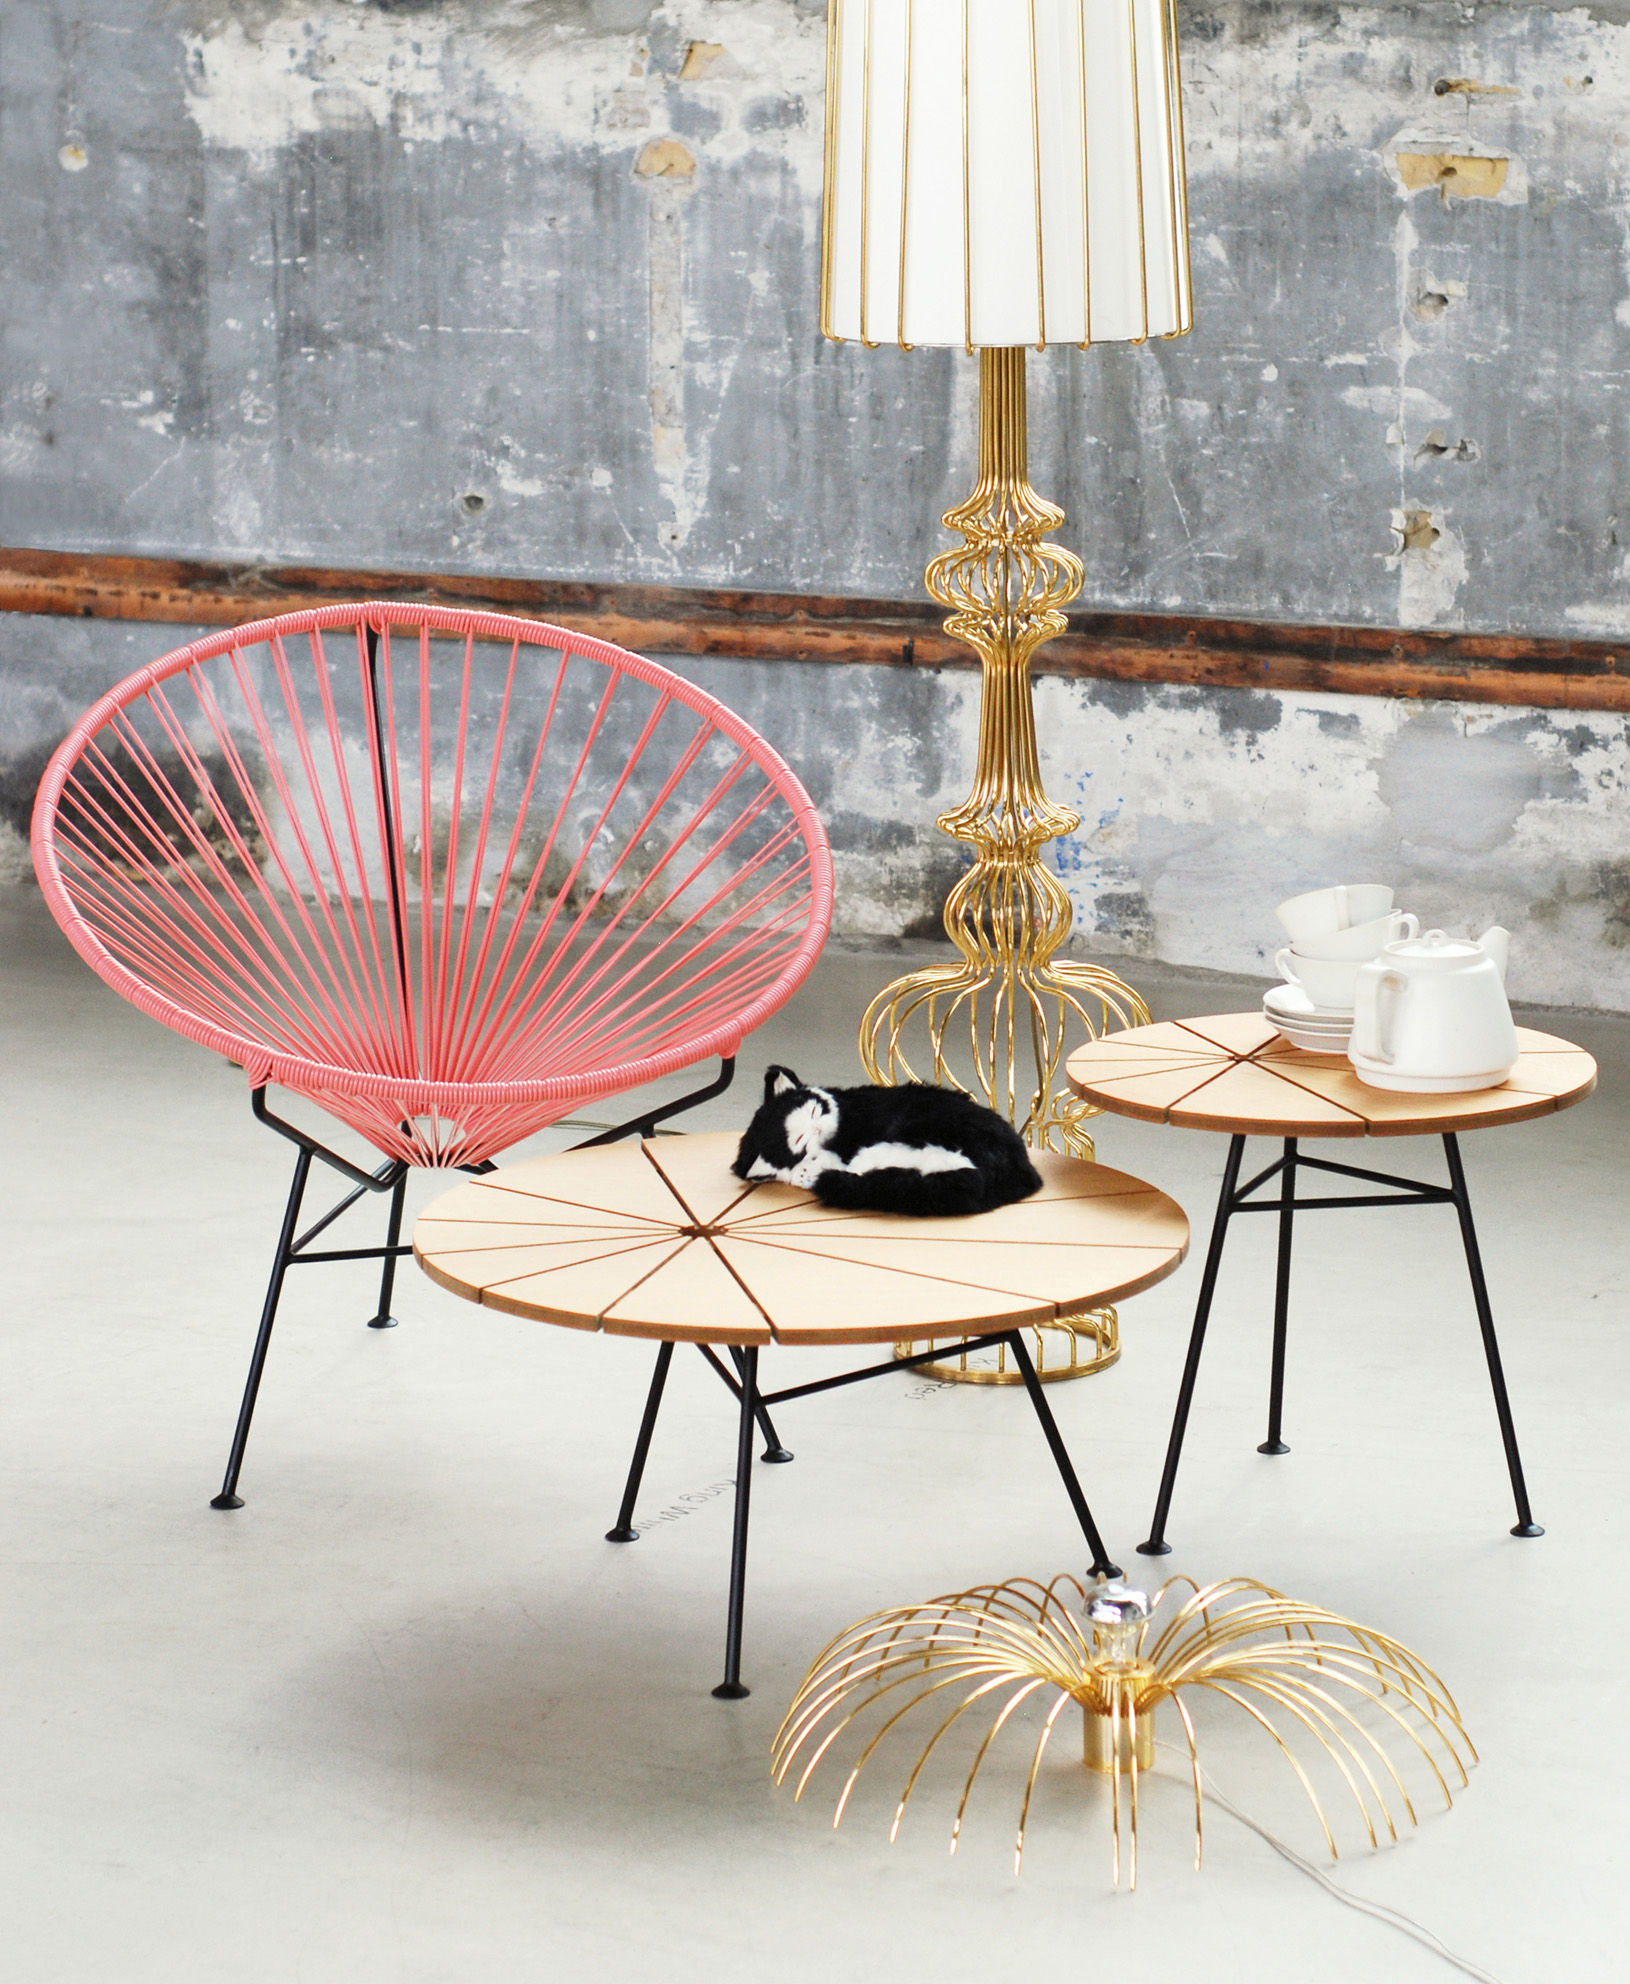 Table basse bam bam ok design pour sentou edition ch ne naturel h 44 x 50 made in design - Sentou table basse ...